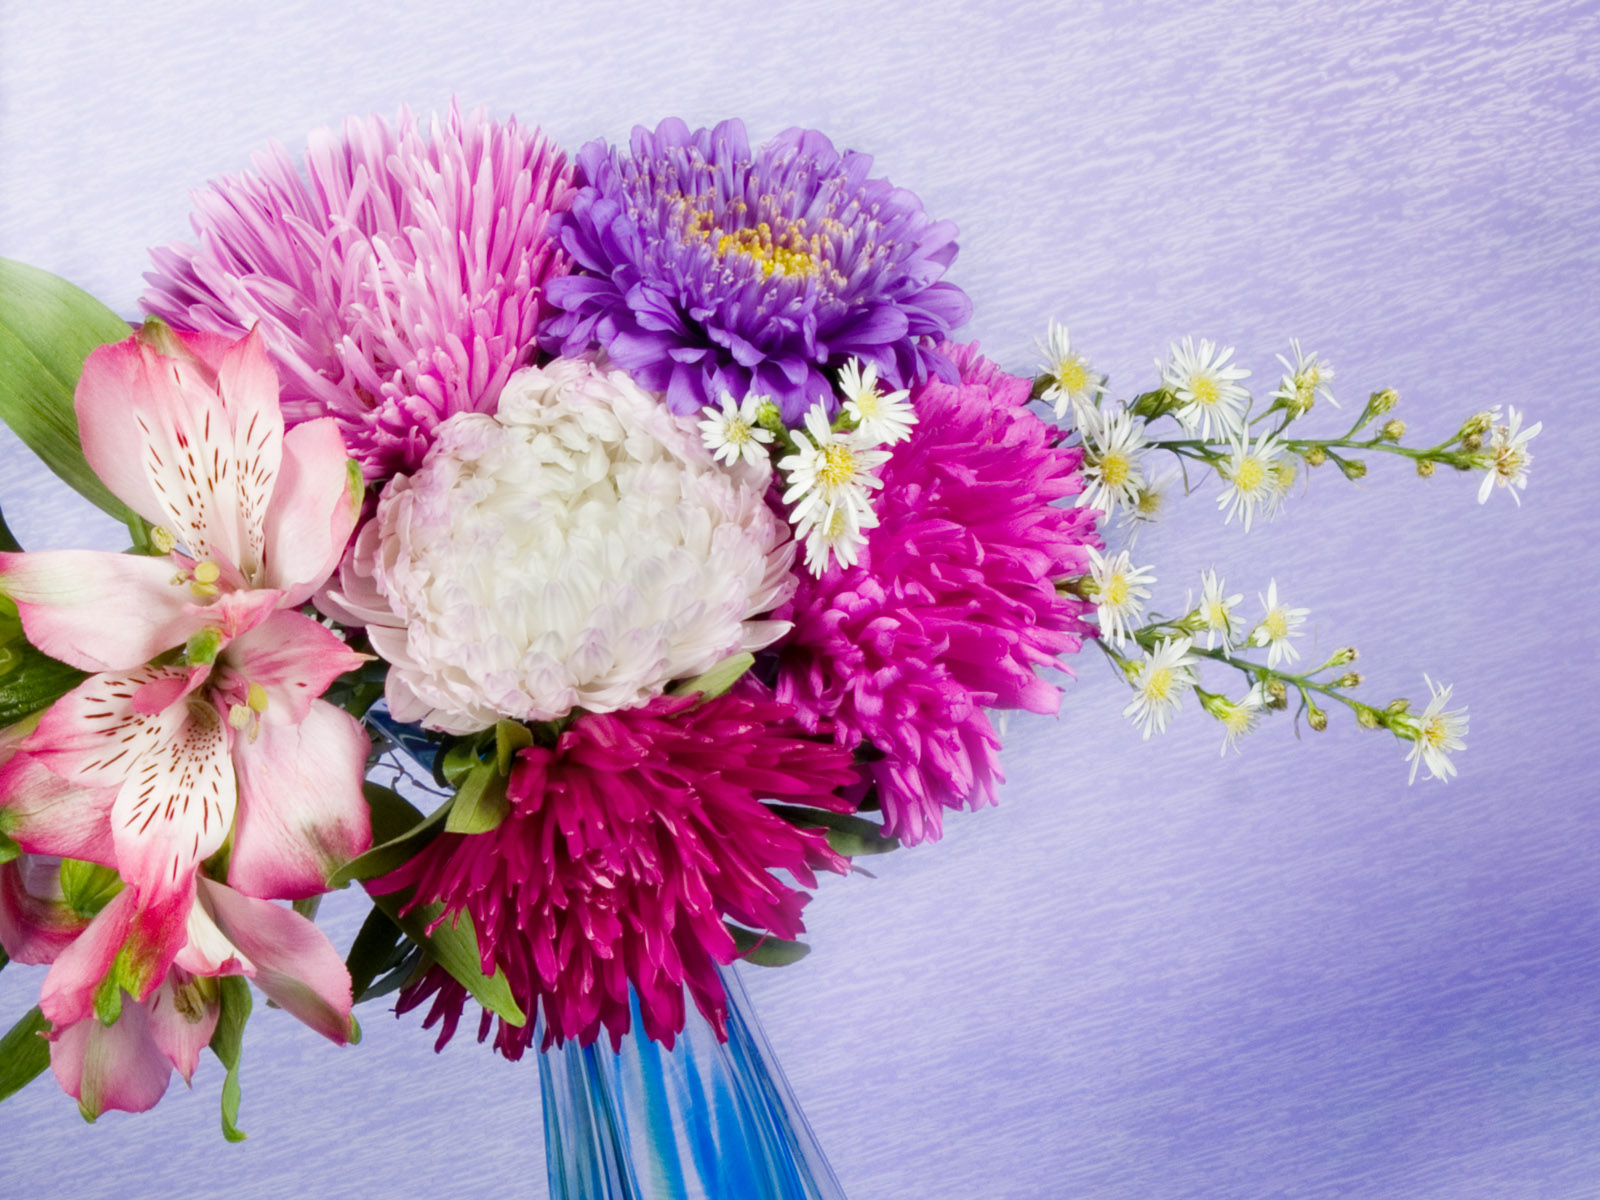 Pastels Carnation Colours - Pastels Carnation Colours